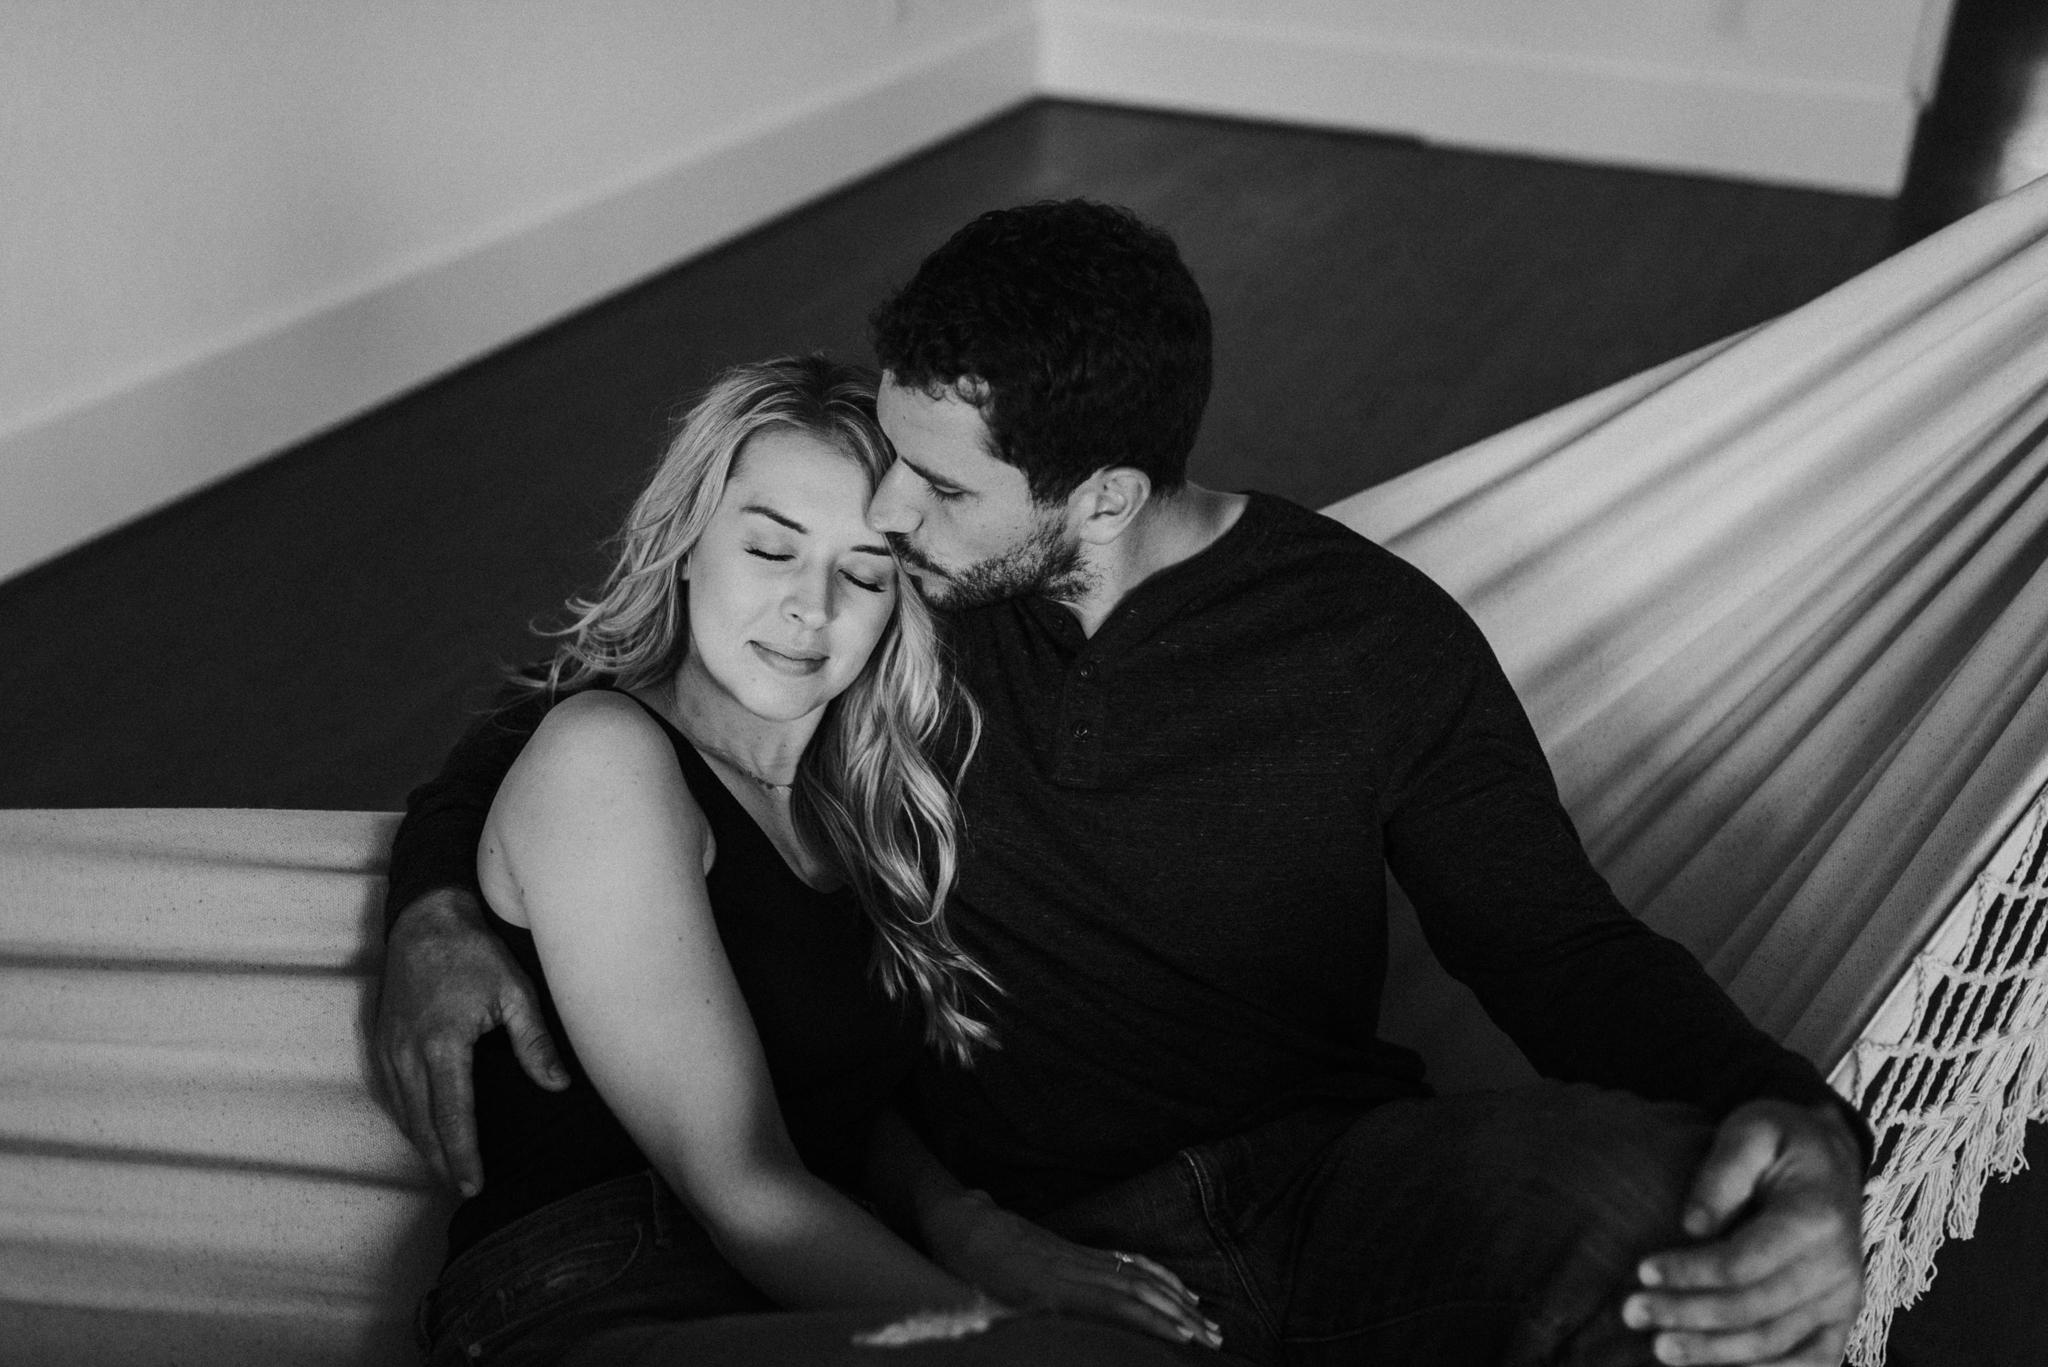 Houston Wedding Photographer-Houston In Home Engagement Session- Houston Wedding Photographer -Kristen Giles Photography-67.jpg